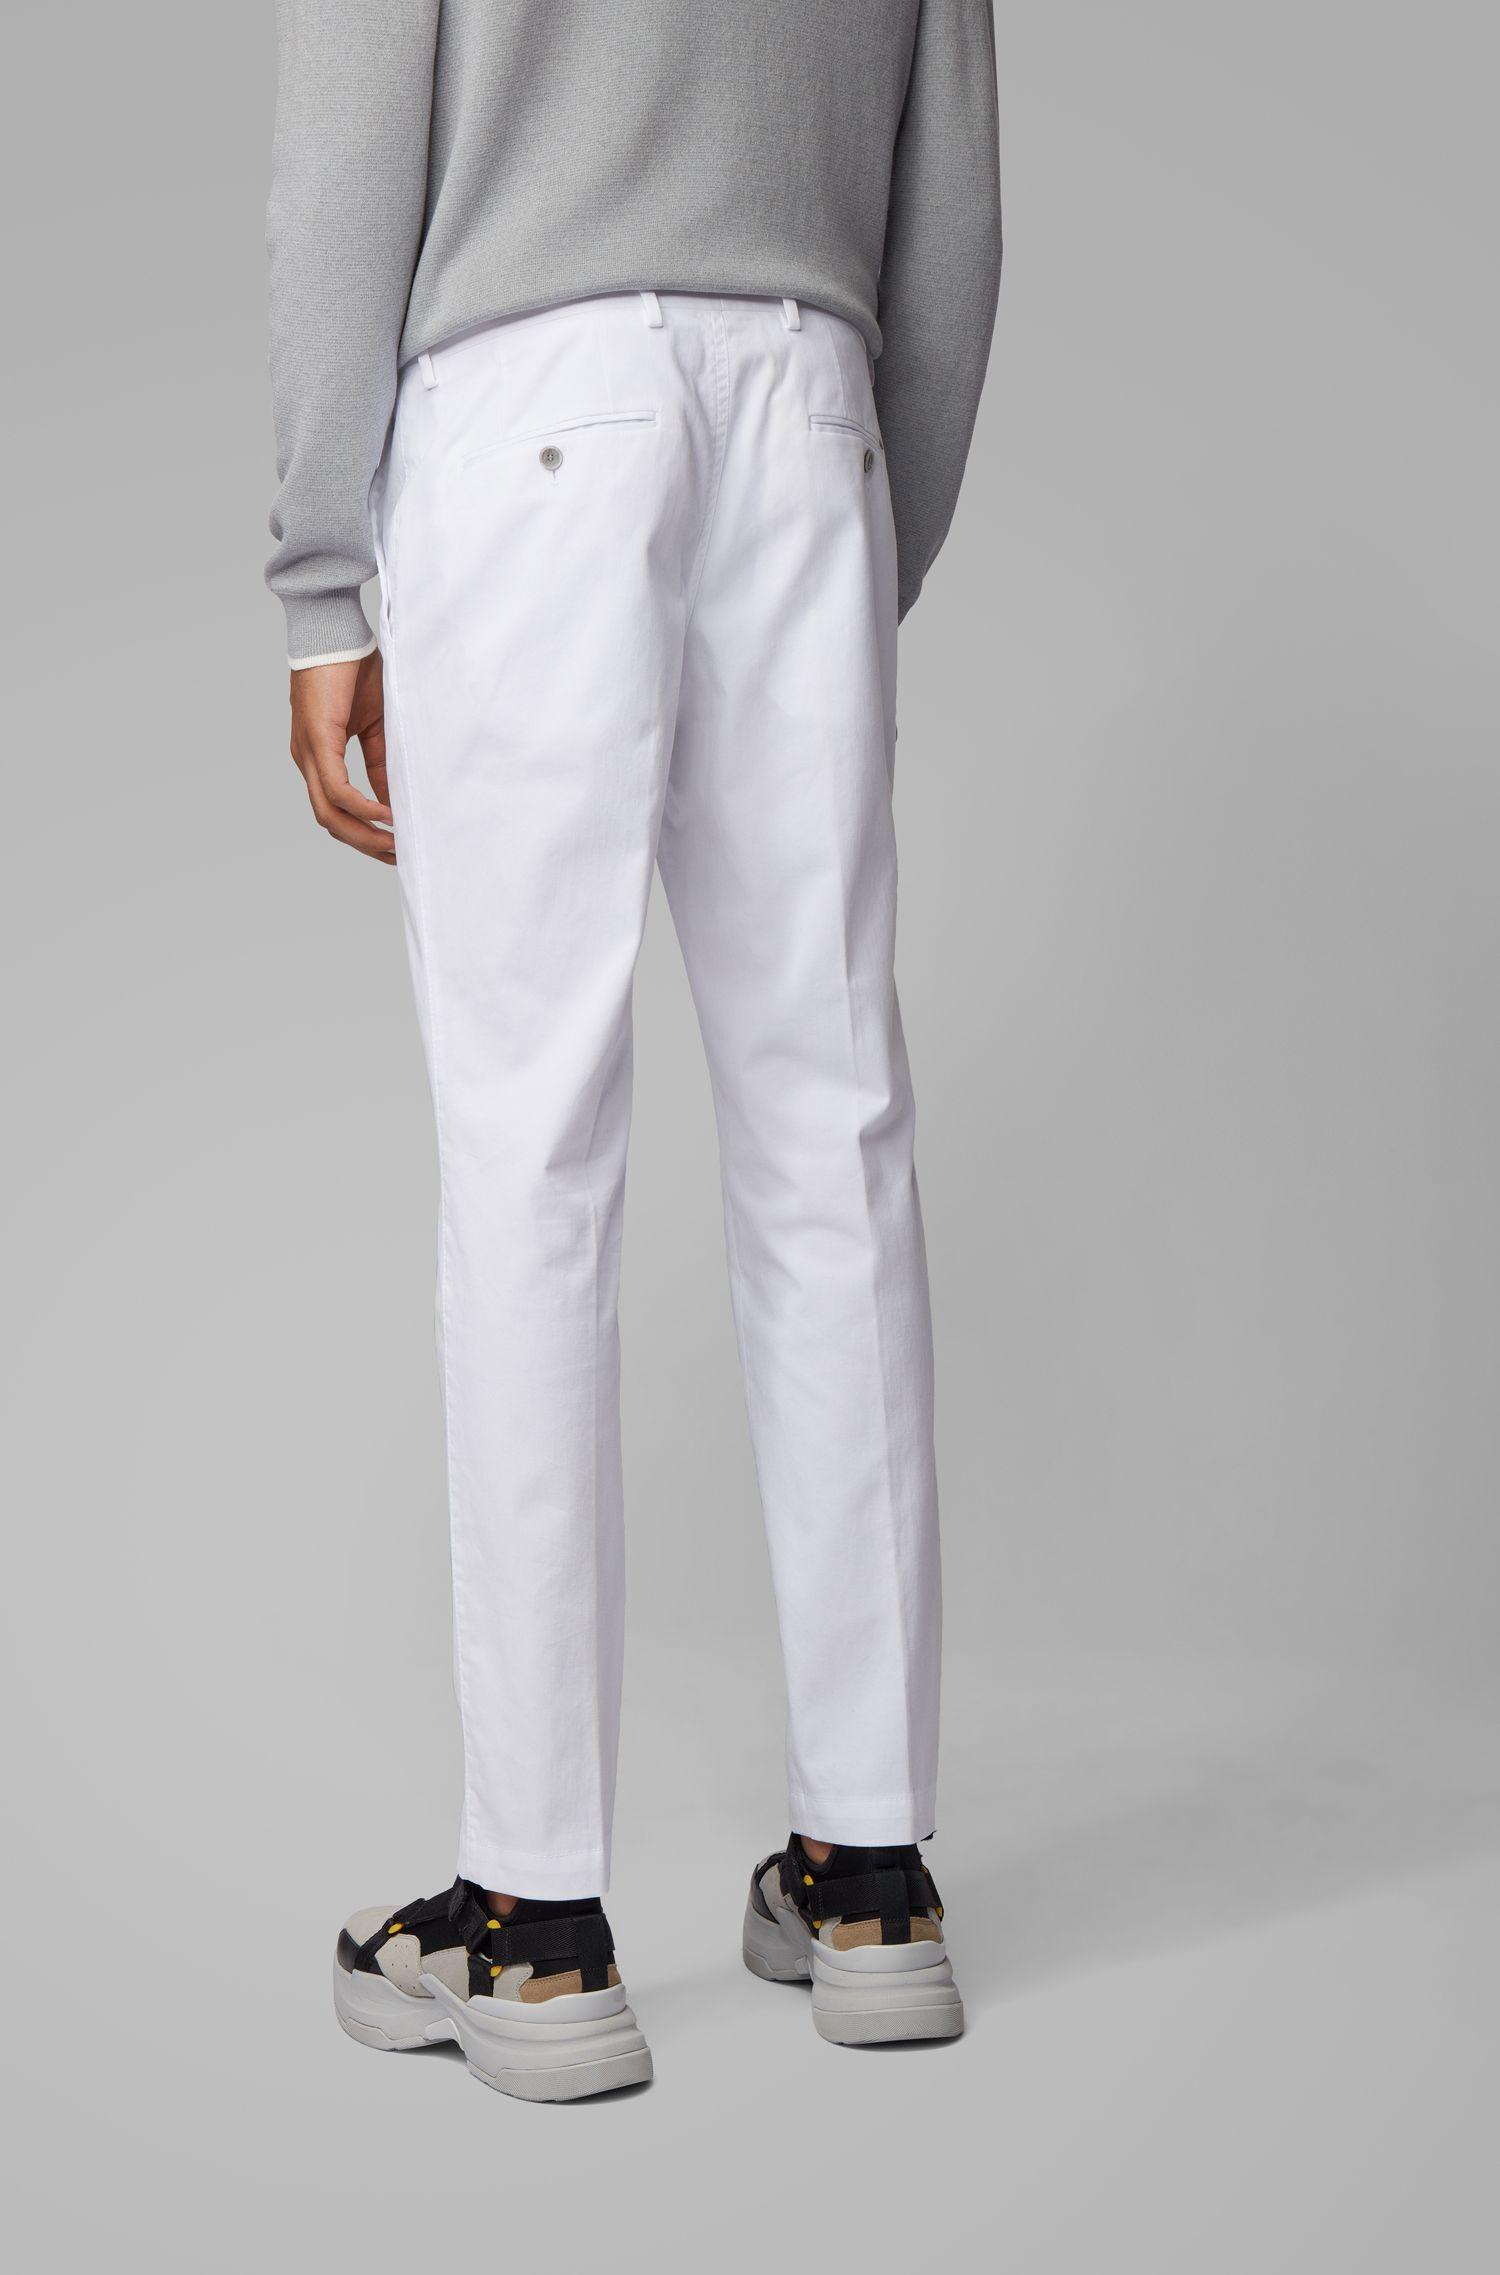 Pantalon SlimFit en coton stretch lavé, Blanc